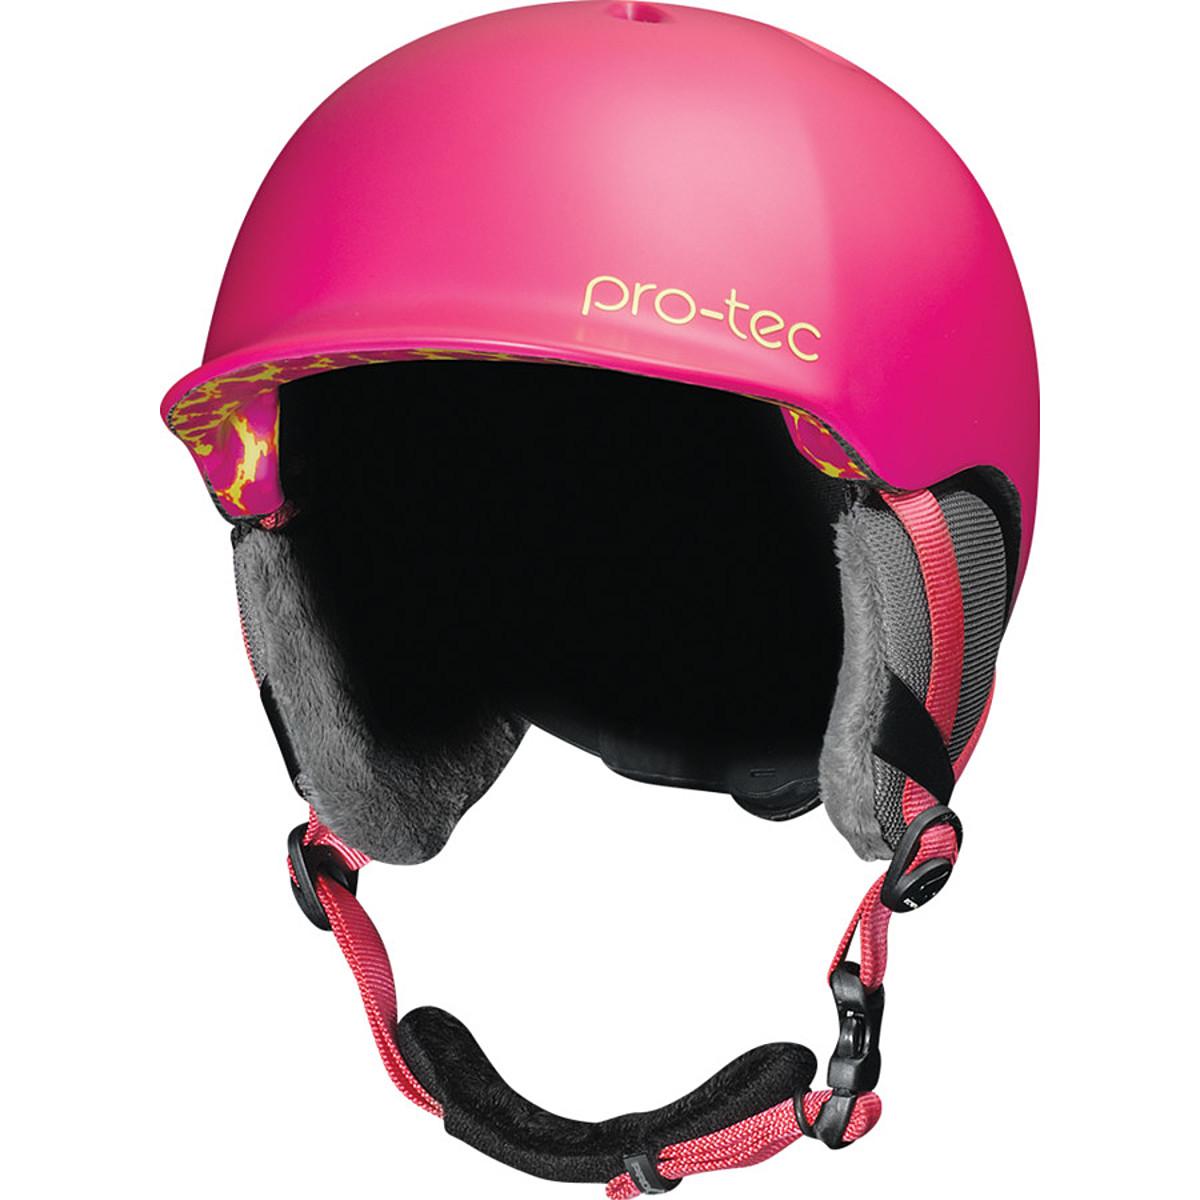 Pro-tec Sparkle Helmet